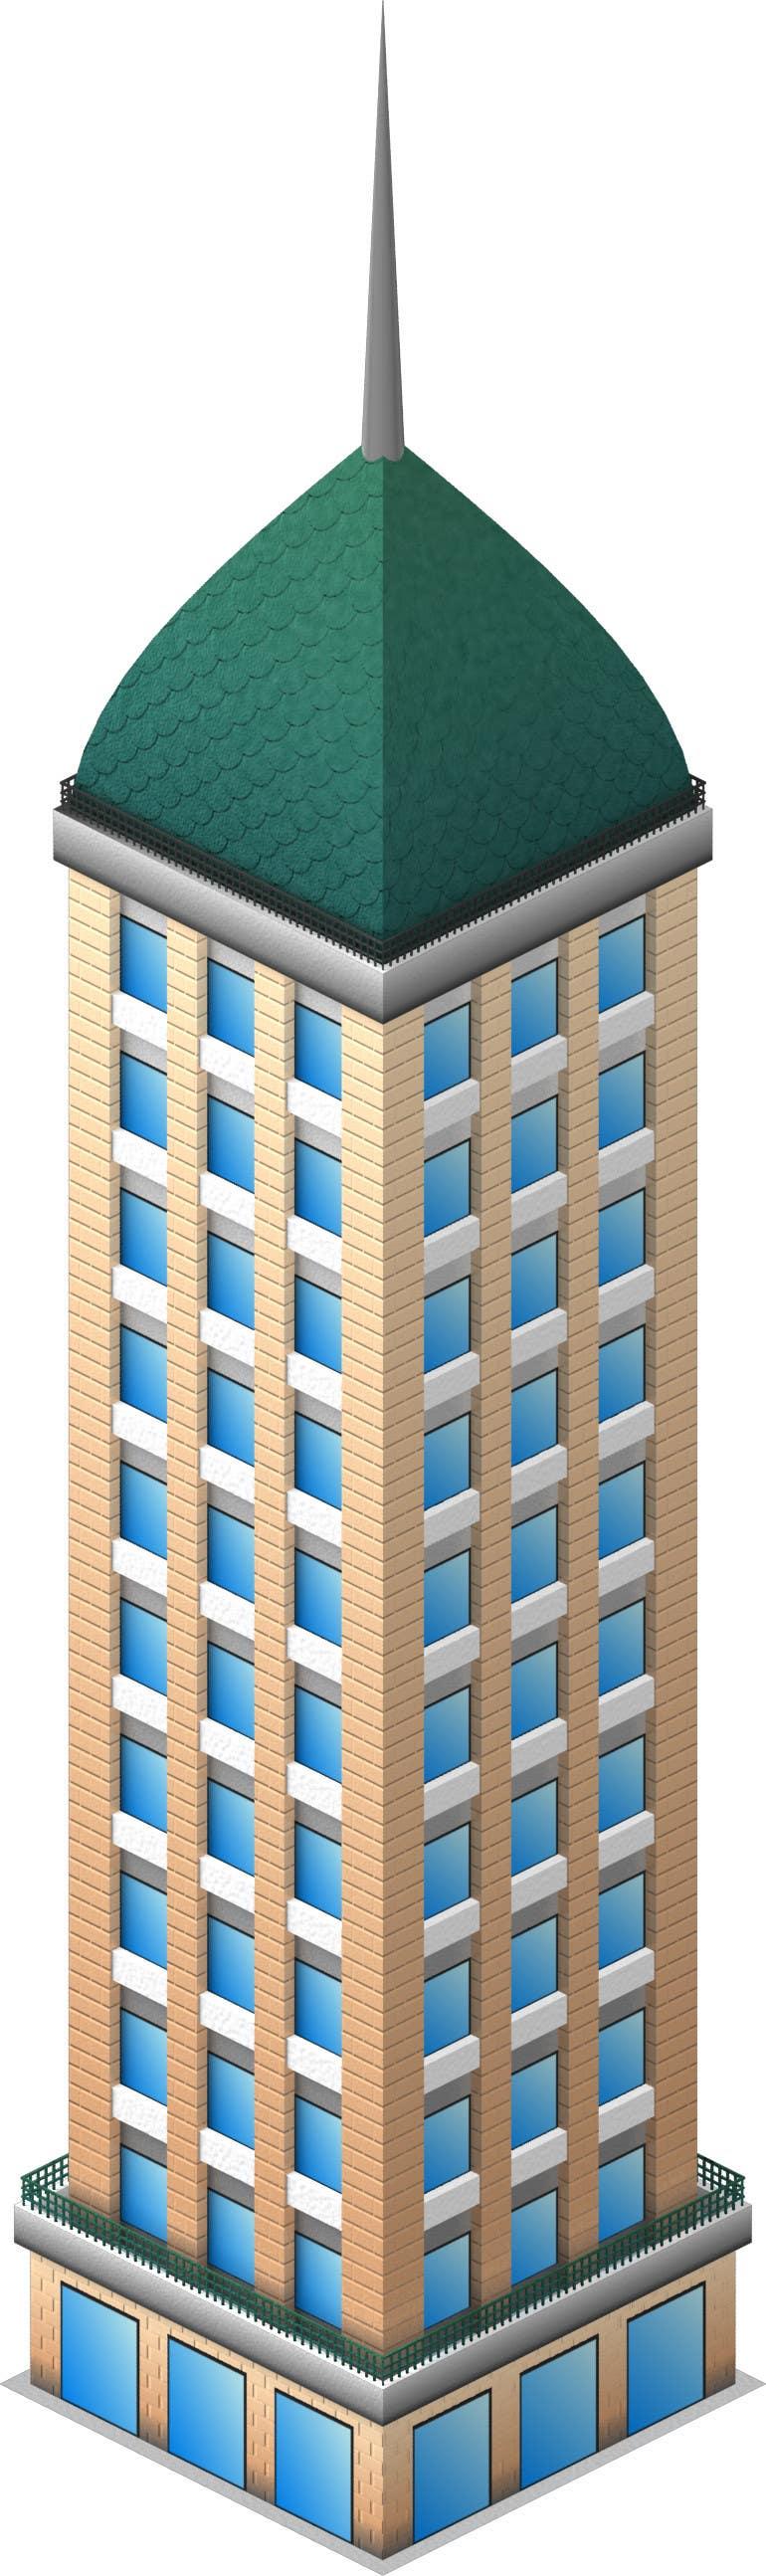 Bài tham dự cuộc thi #                                        3                                      cho                                         Isometric Buildings for Android Game